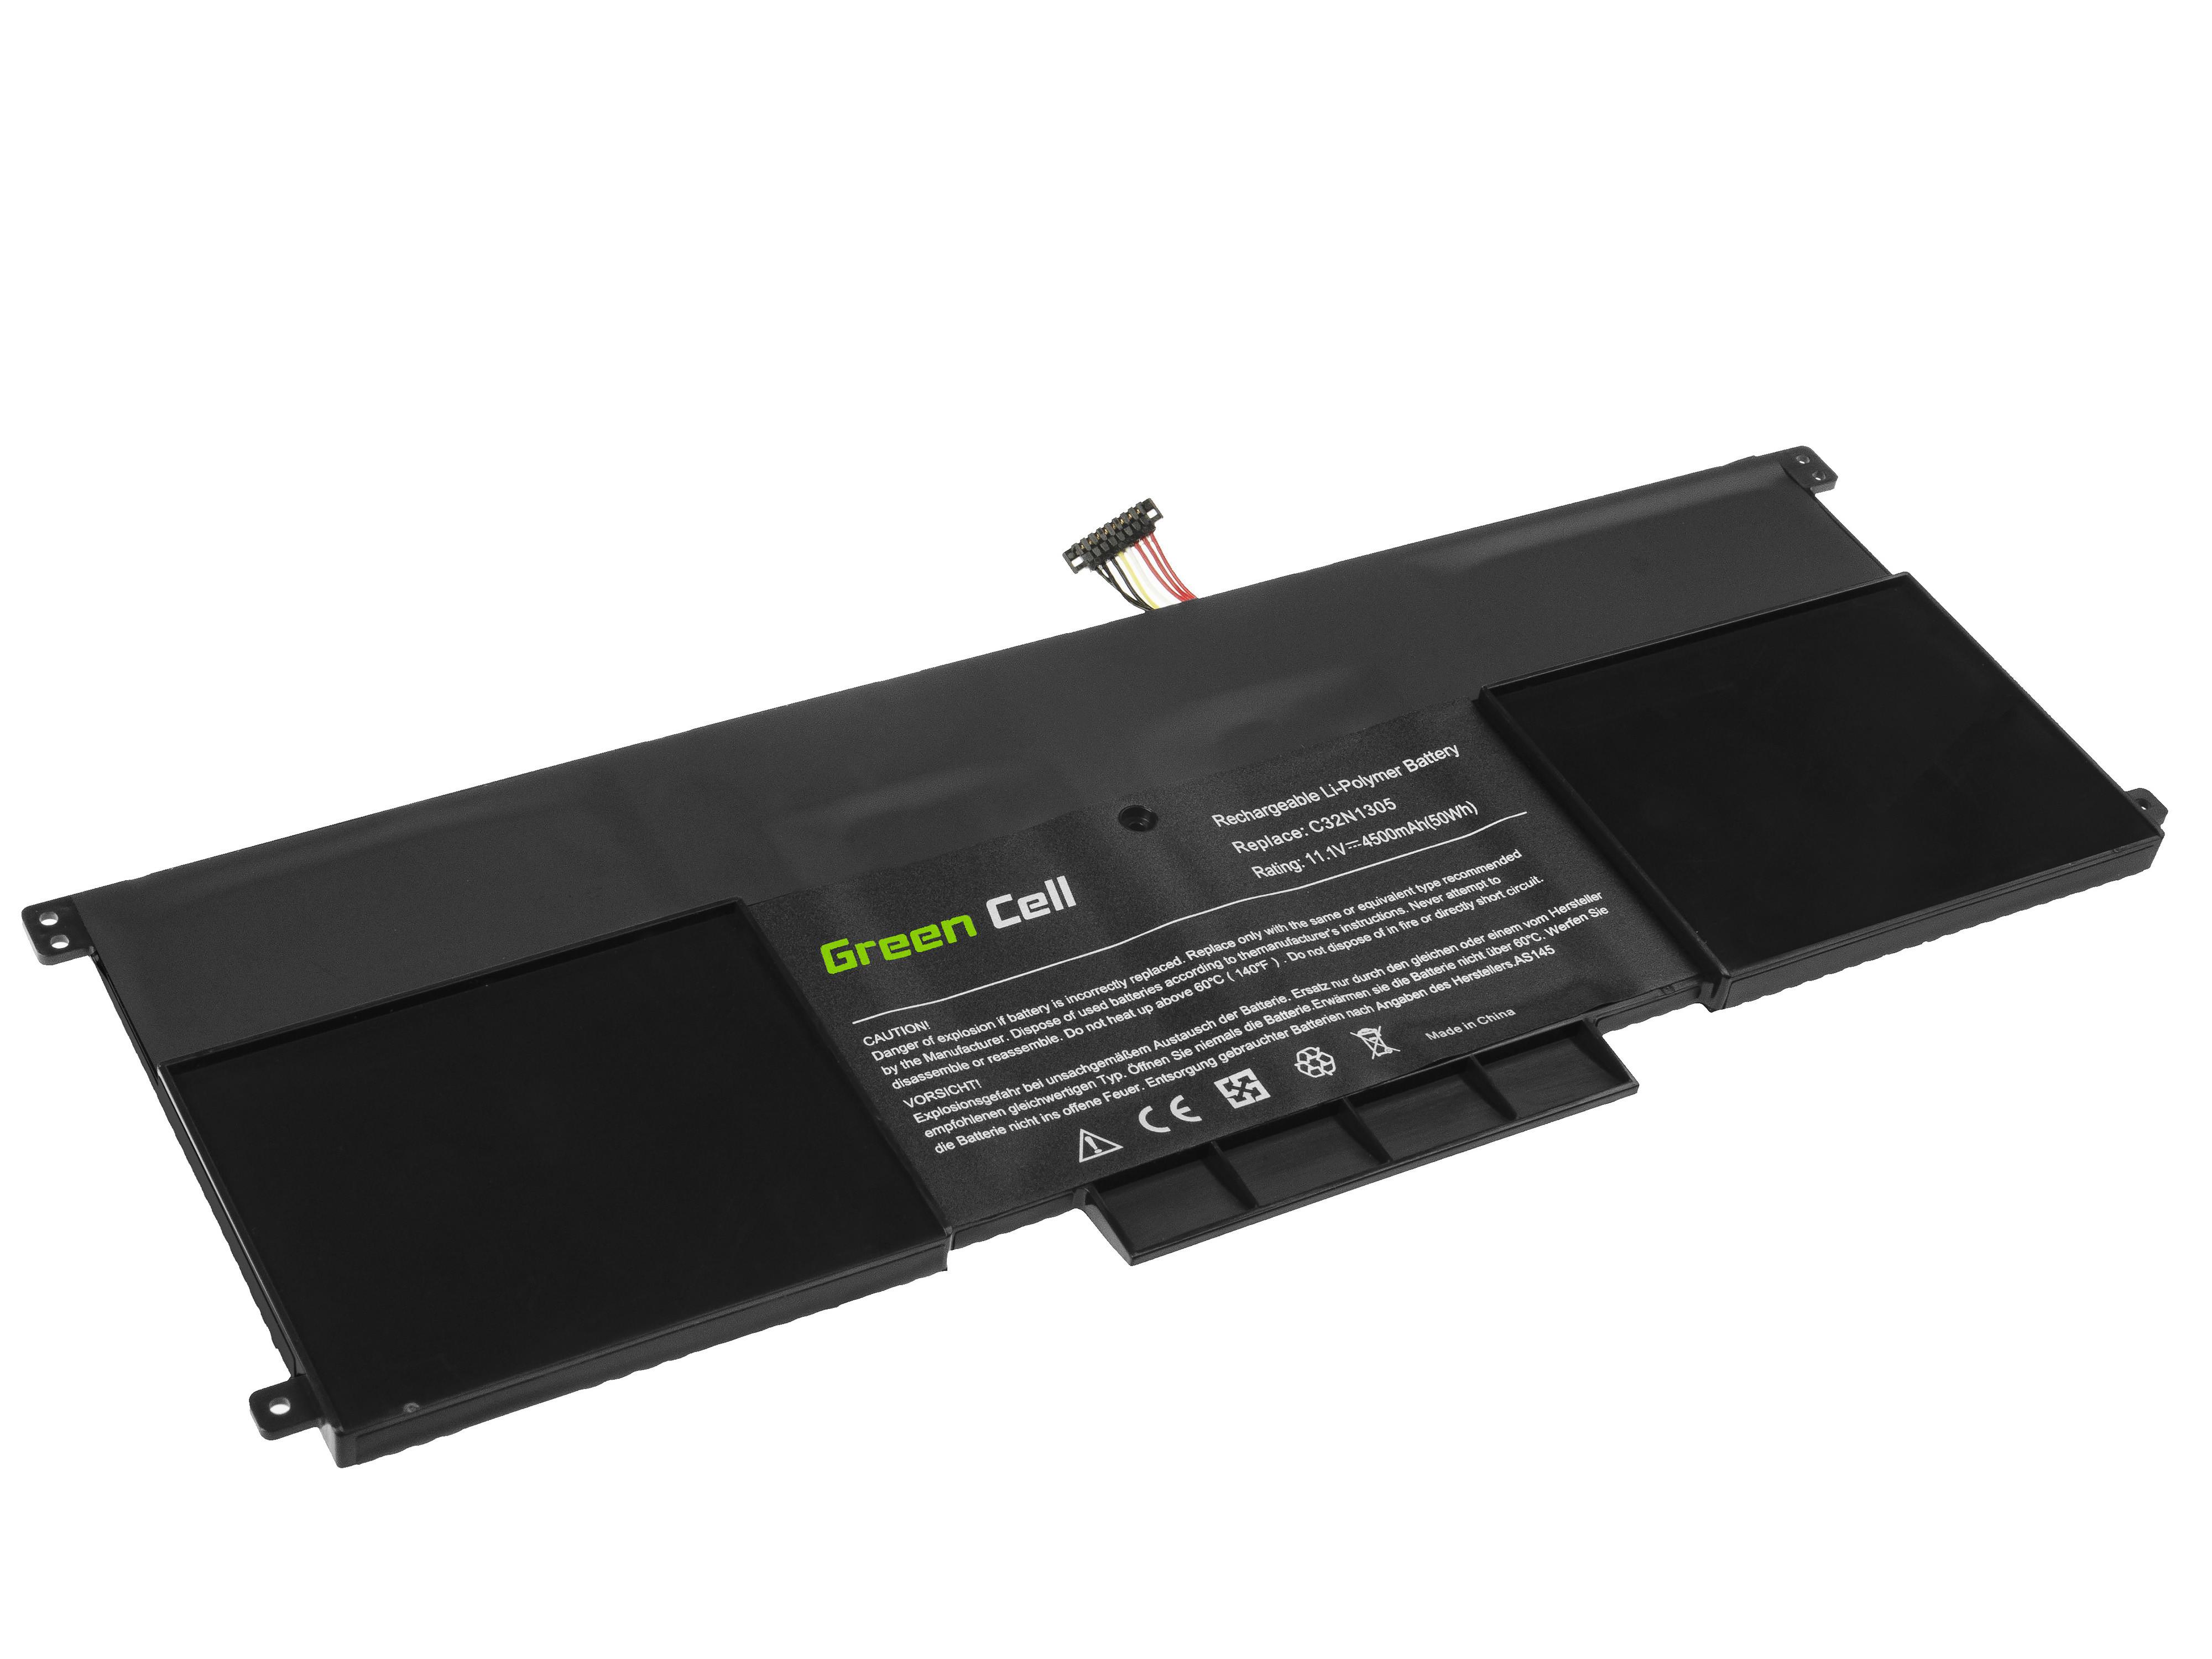 Green Cell AS145 Baterie Asus C32N1305,Asus ZenBook UX301 UX301L UX301LA 4500mAh Li-Pol – neoriginální